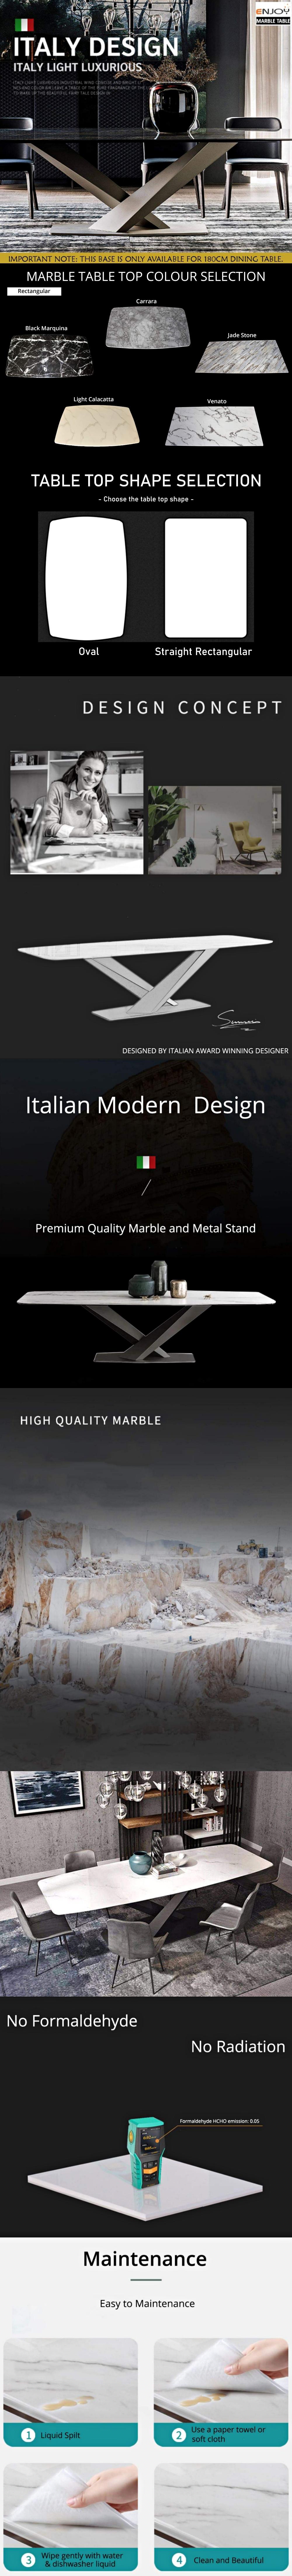 Rectangular-V-Base-Dining-Table-Item-Description-1